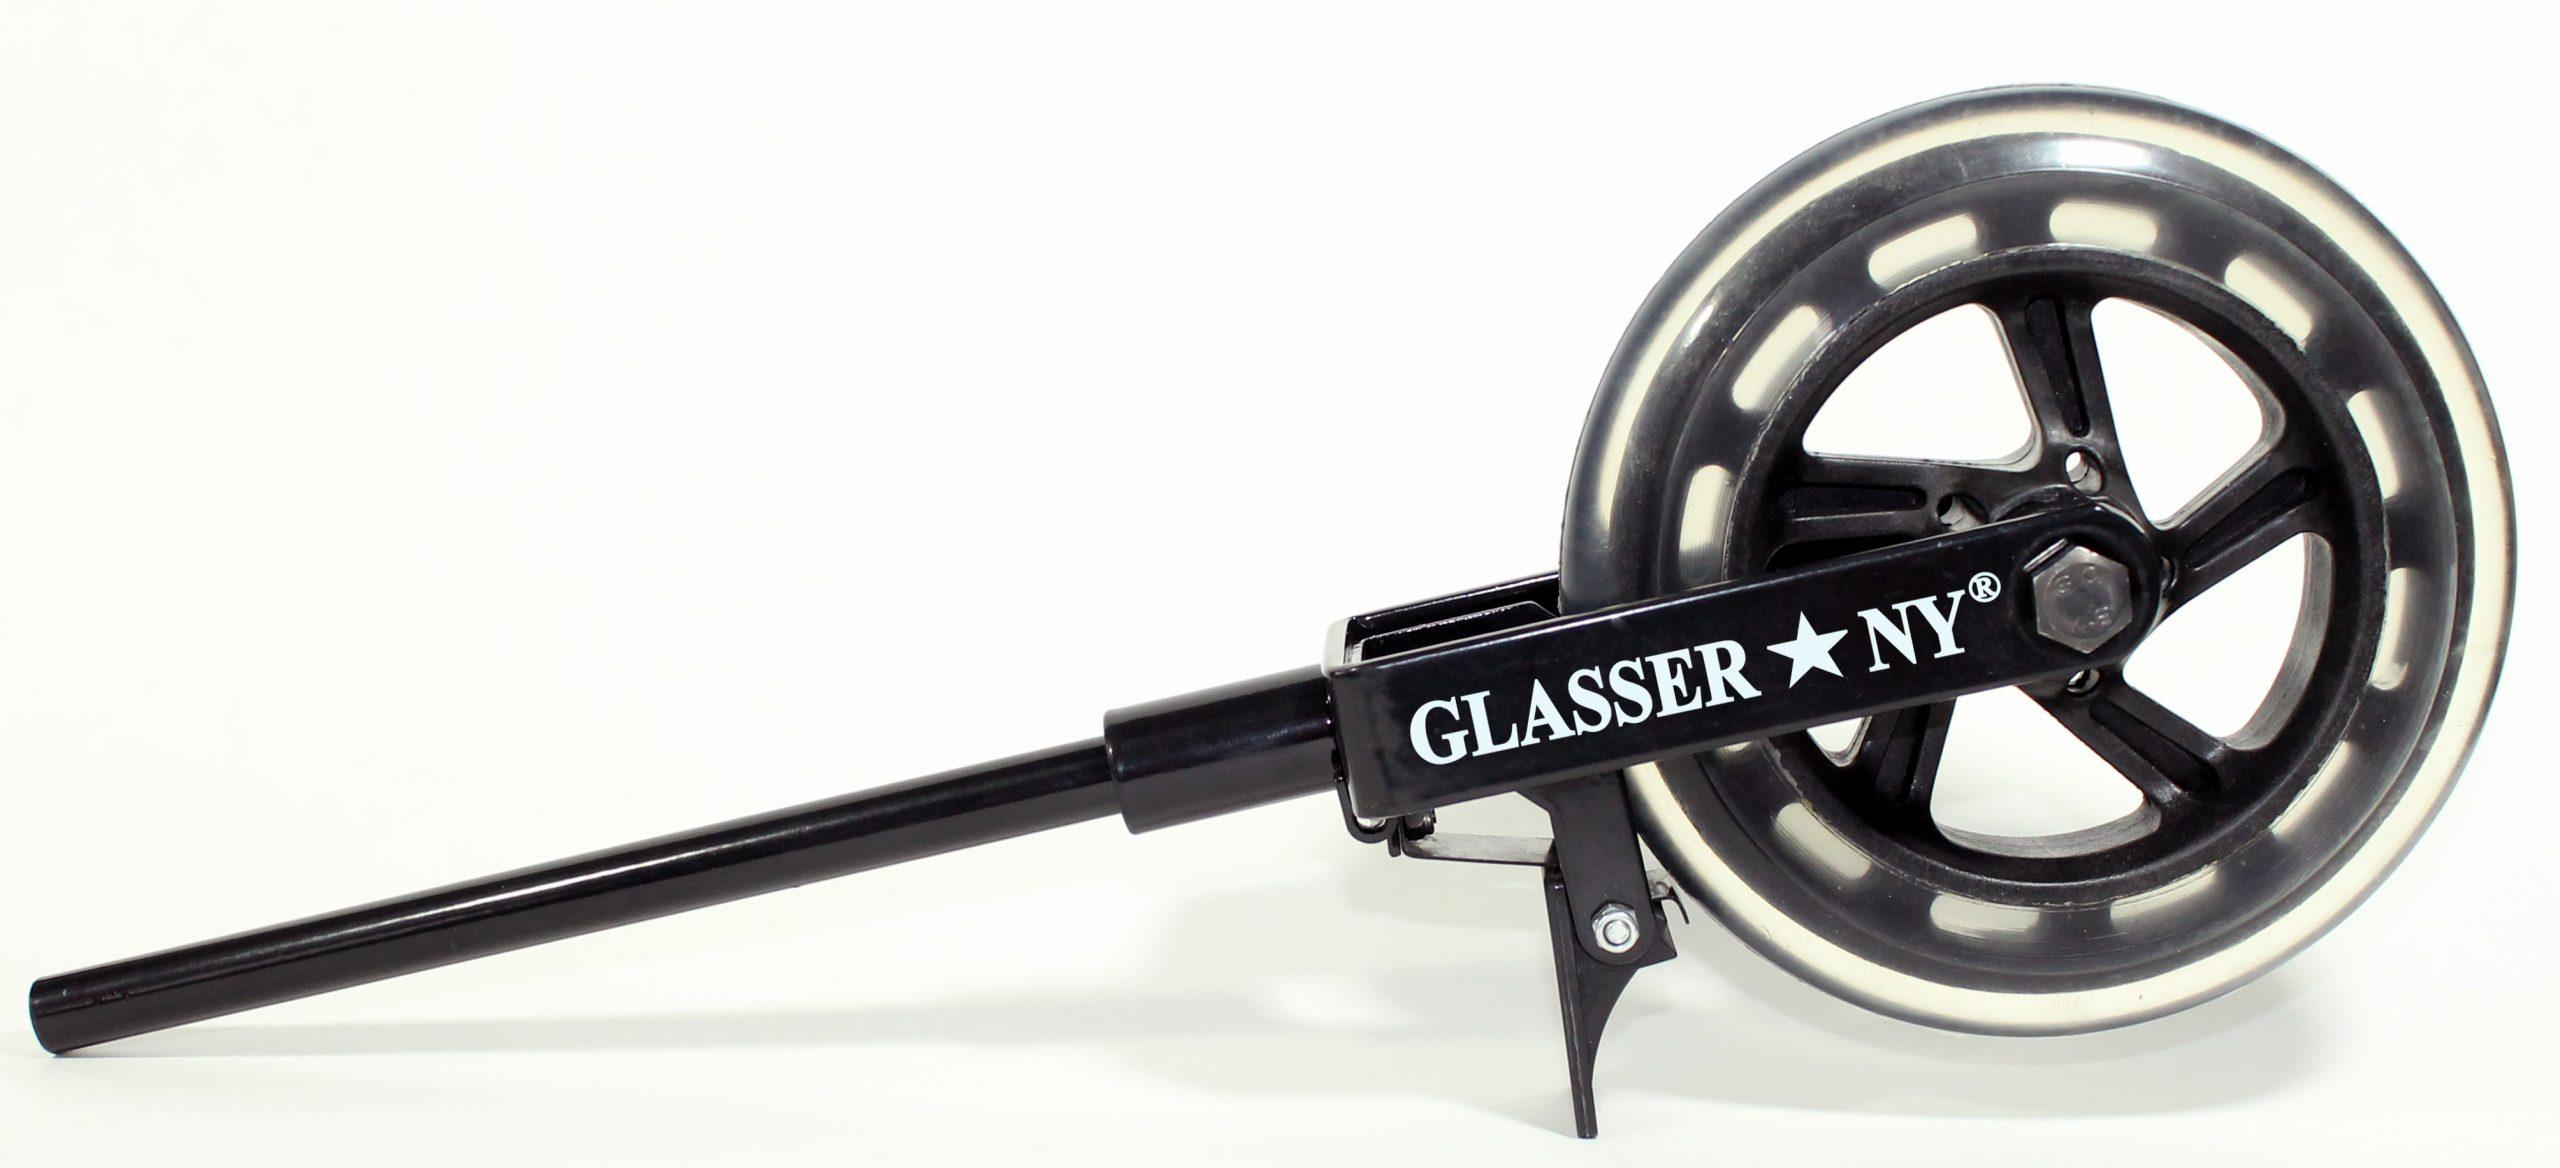 Bass Wheel 12 mm with brake